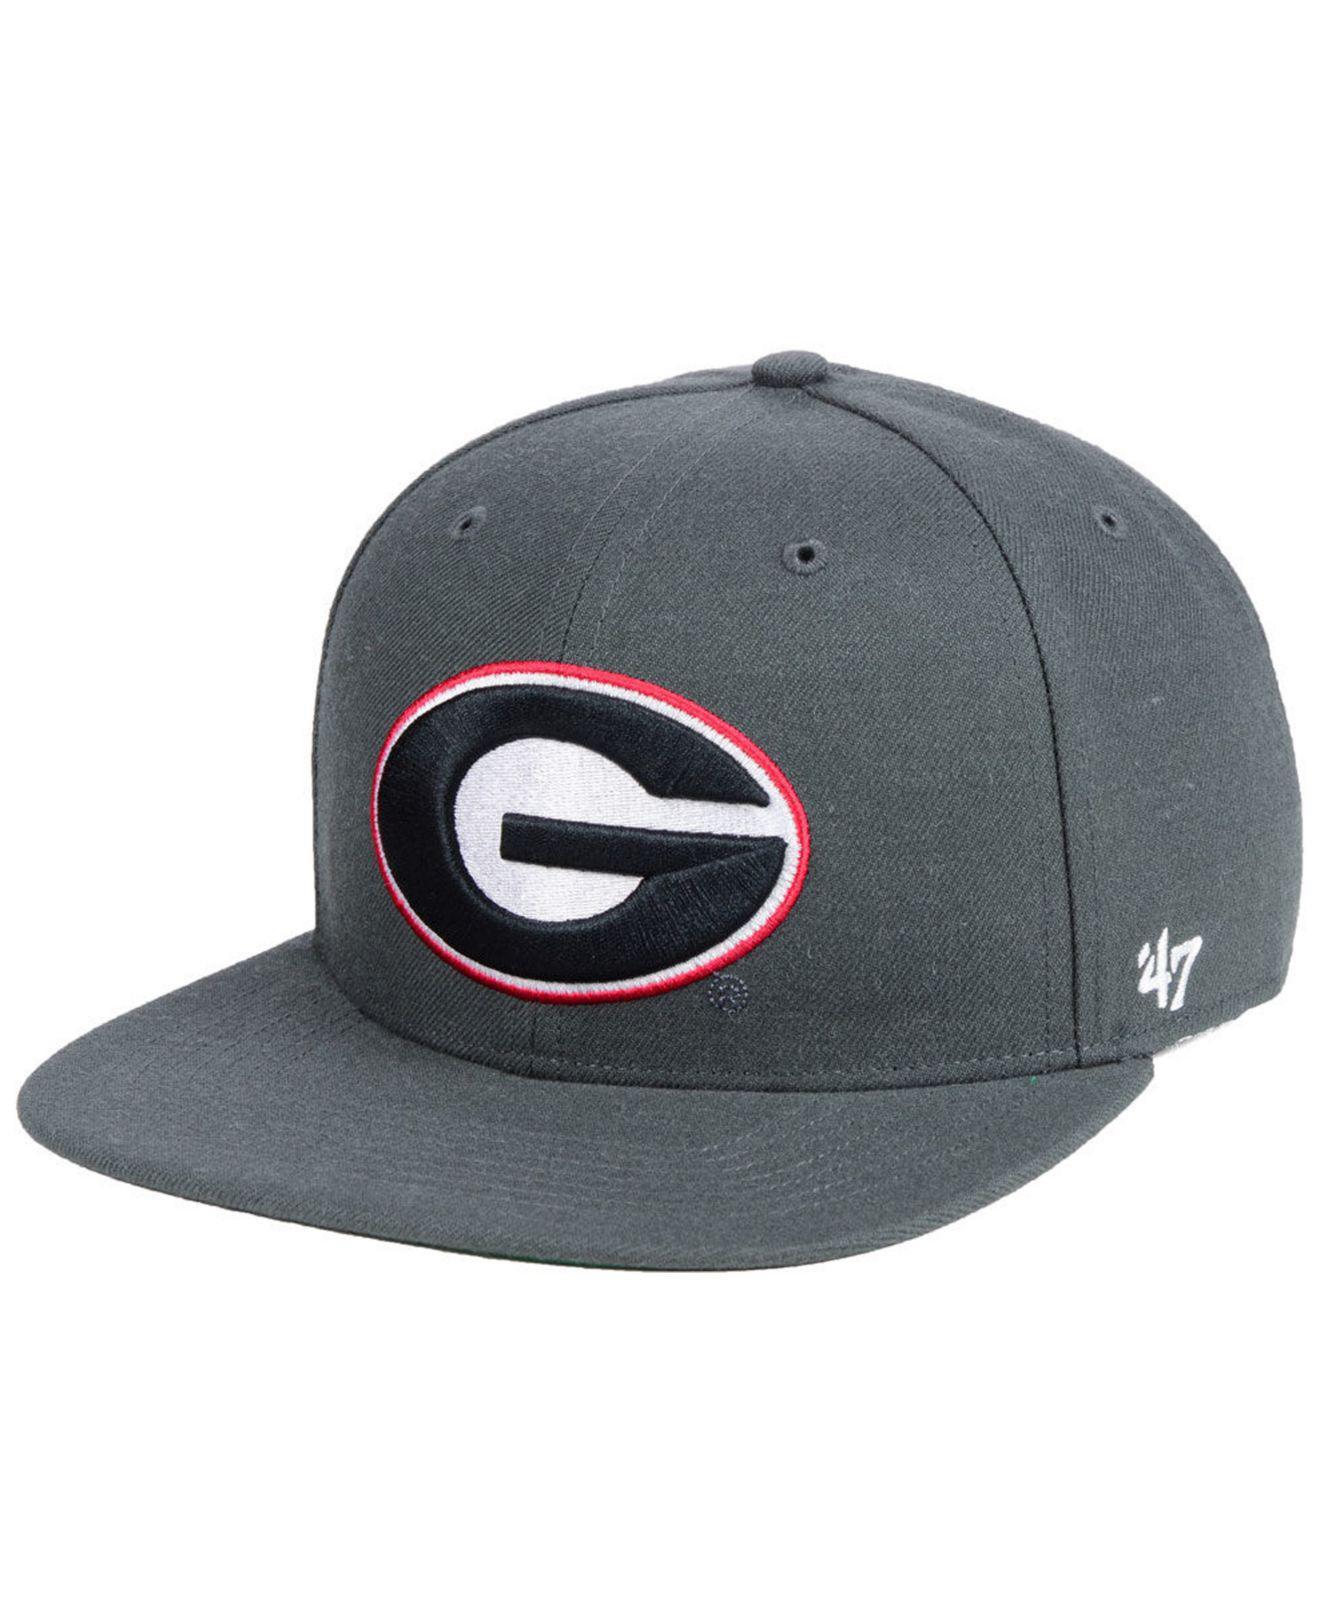 58469d1fff0 Lyst - 47 Brand Georgia Bulldogs Core Fitted Cap in Gray for Men